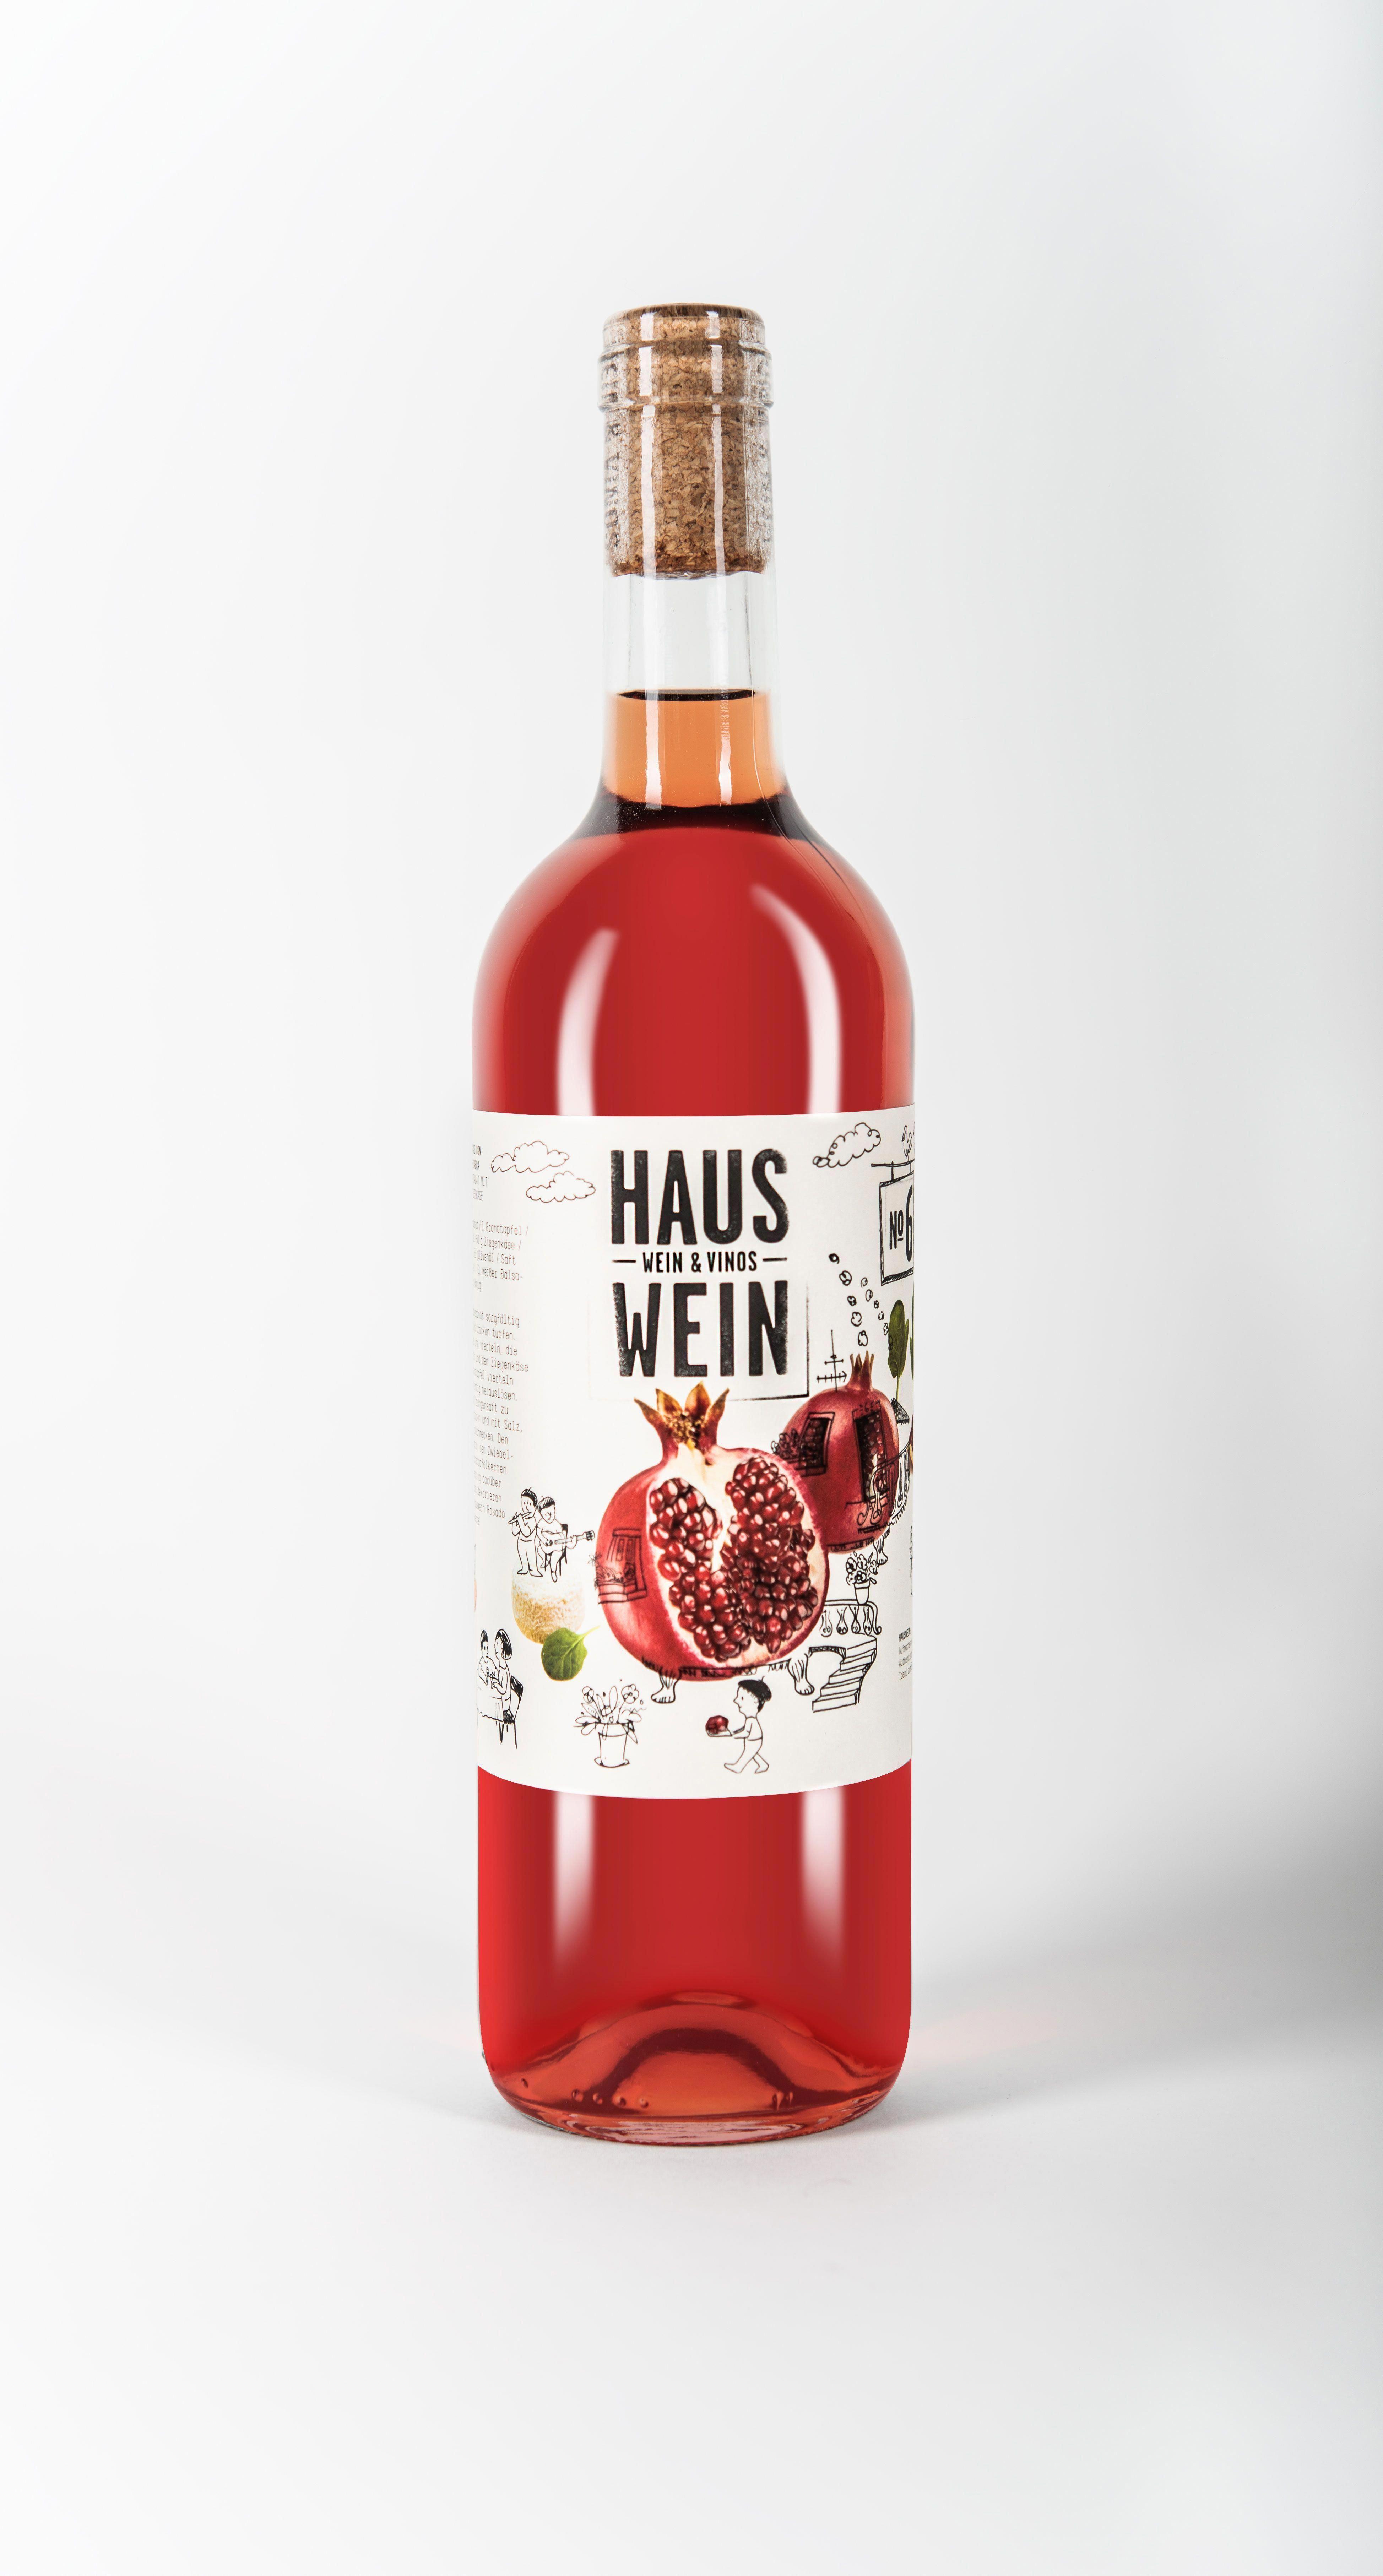 Shipping Wine Fedex Code 2783445595 Wine Drinks Wine Brands Wine Gifts